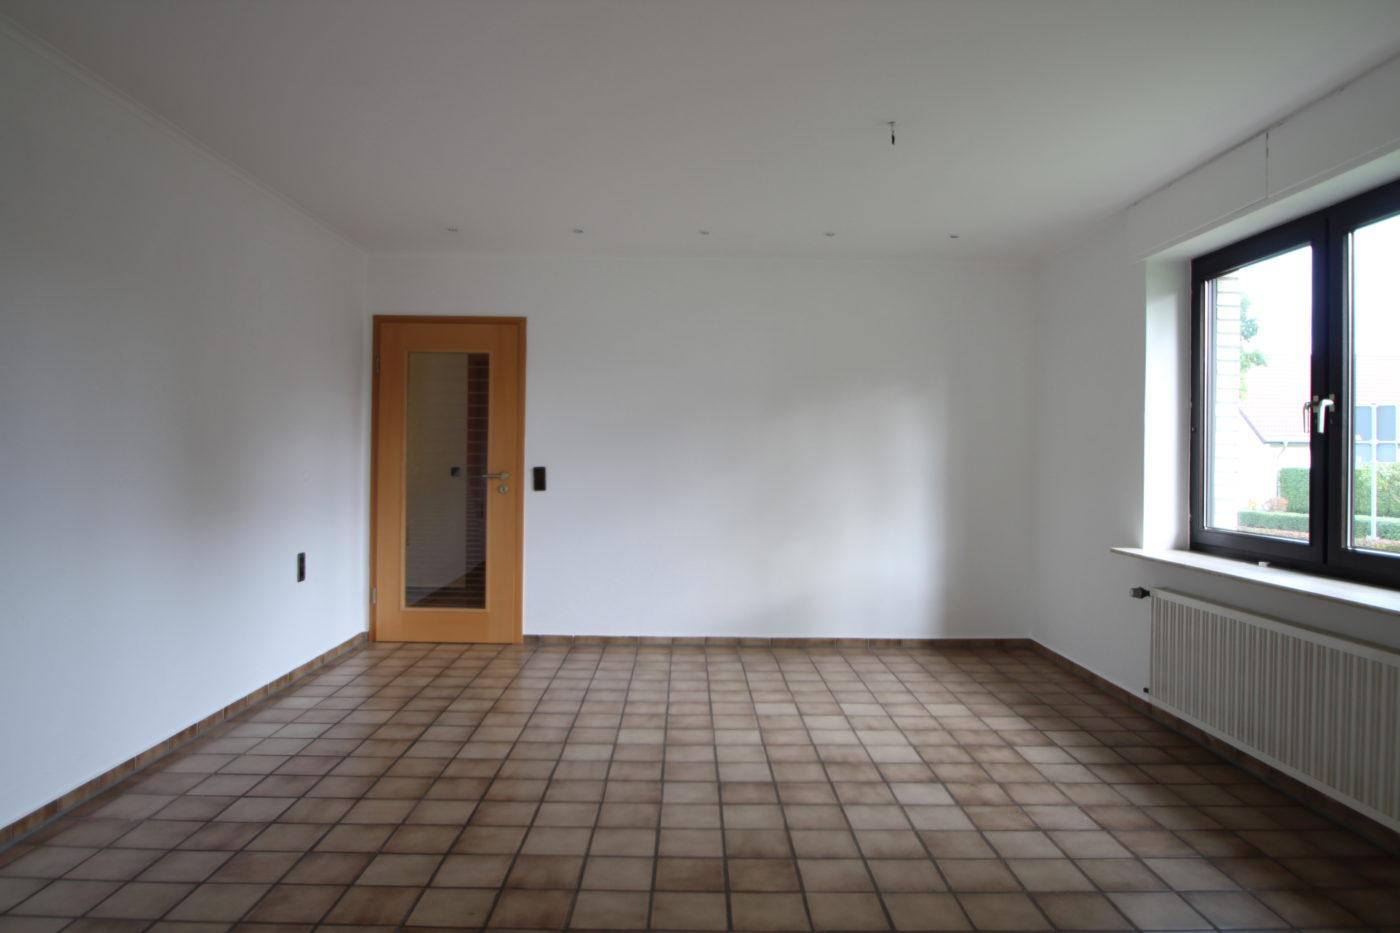 Vorher Foto vom Esszimmer. Esszimmer vor dem Homestaging durch Blickfang Homestaging in Soest